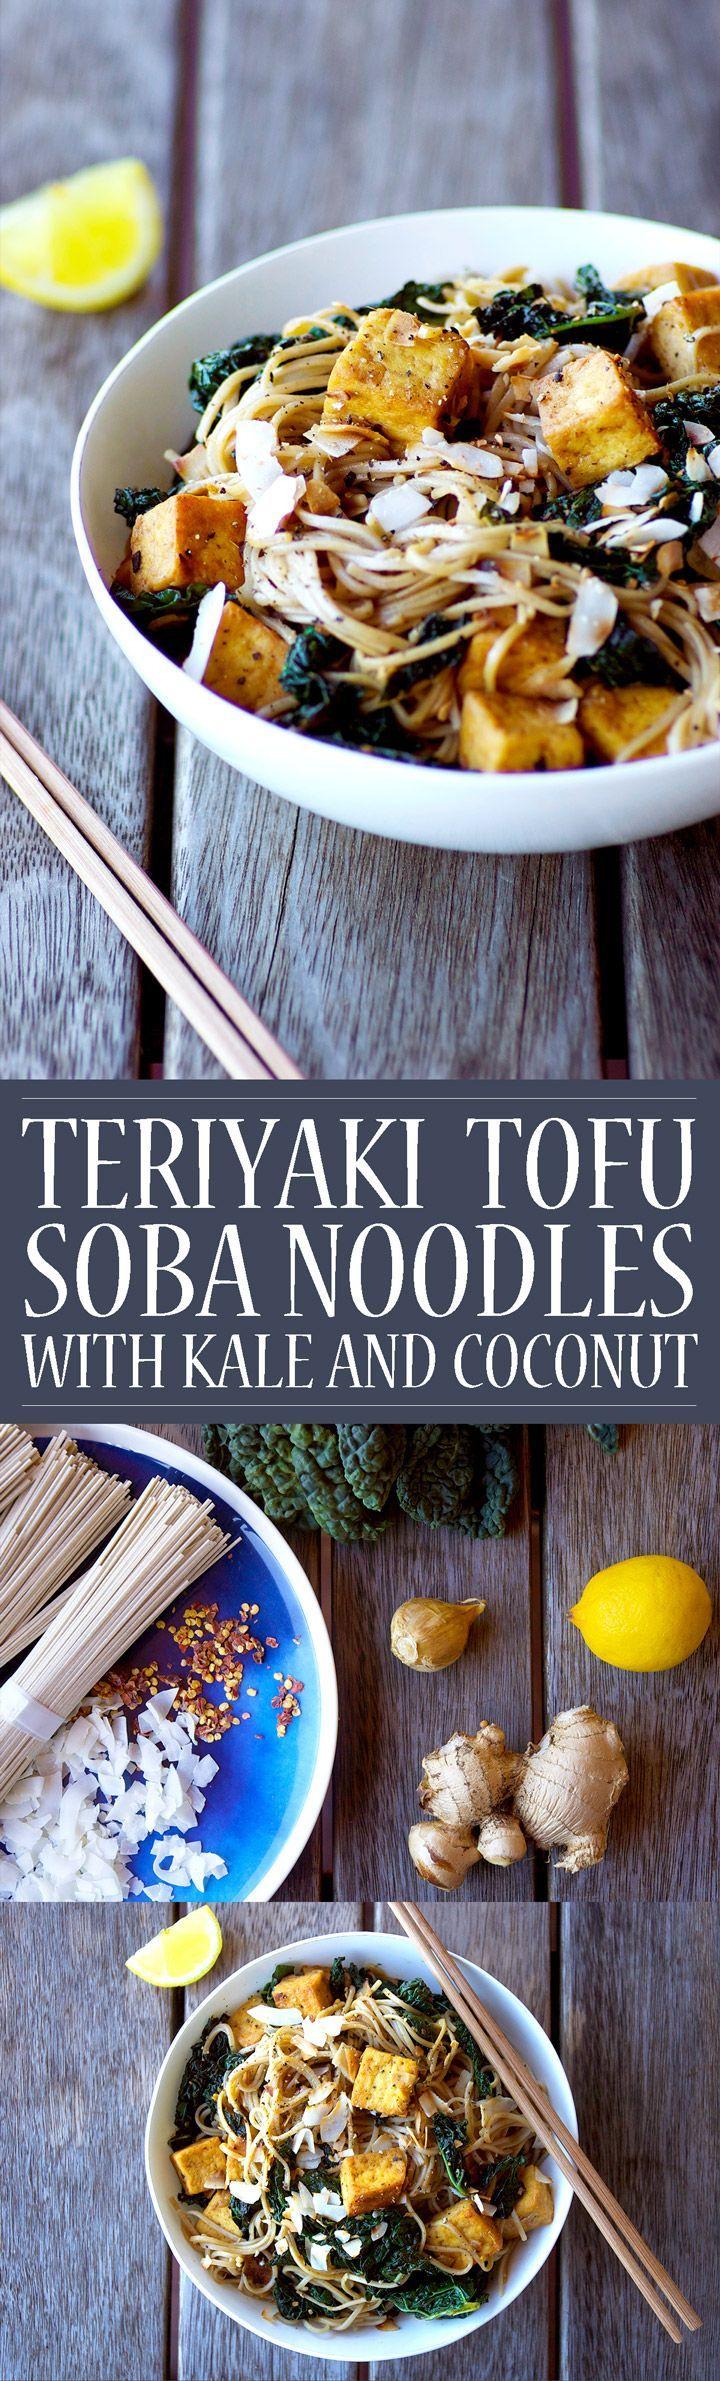 Teriyaki Tofu Soba Noodles with Kale and Coconut! Vegan, gluten free, grain free